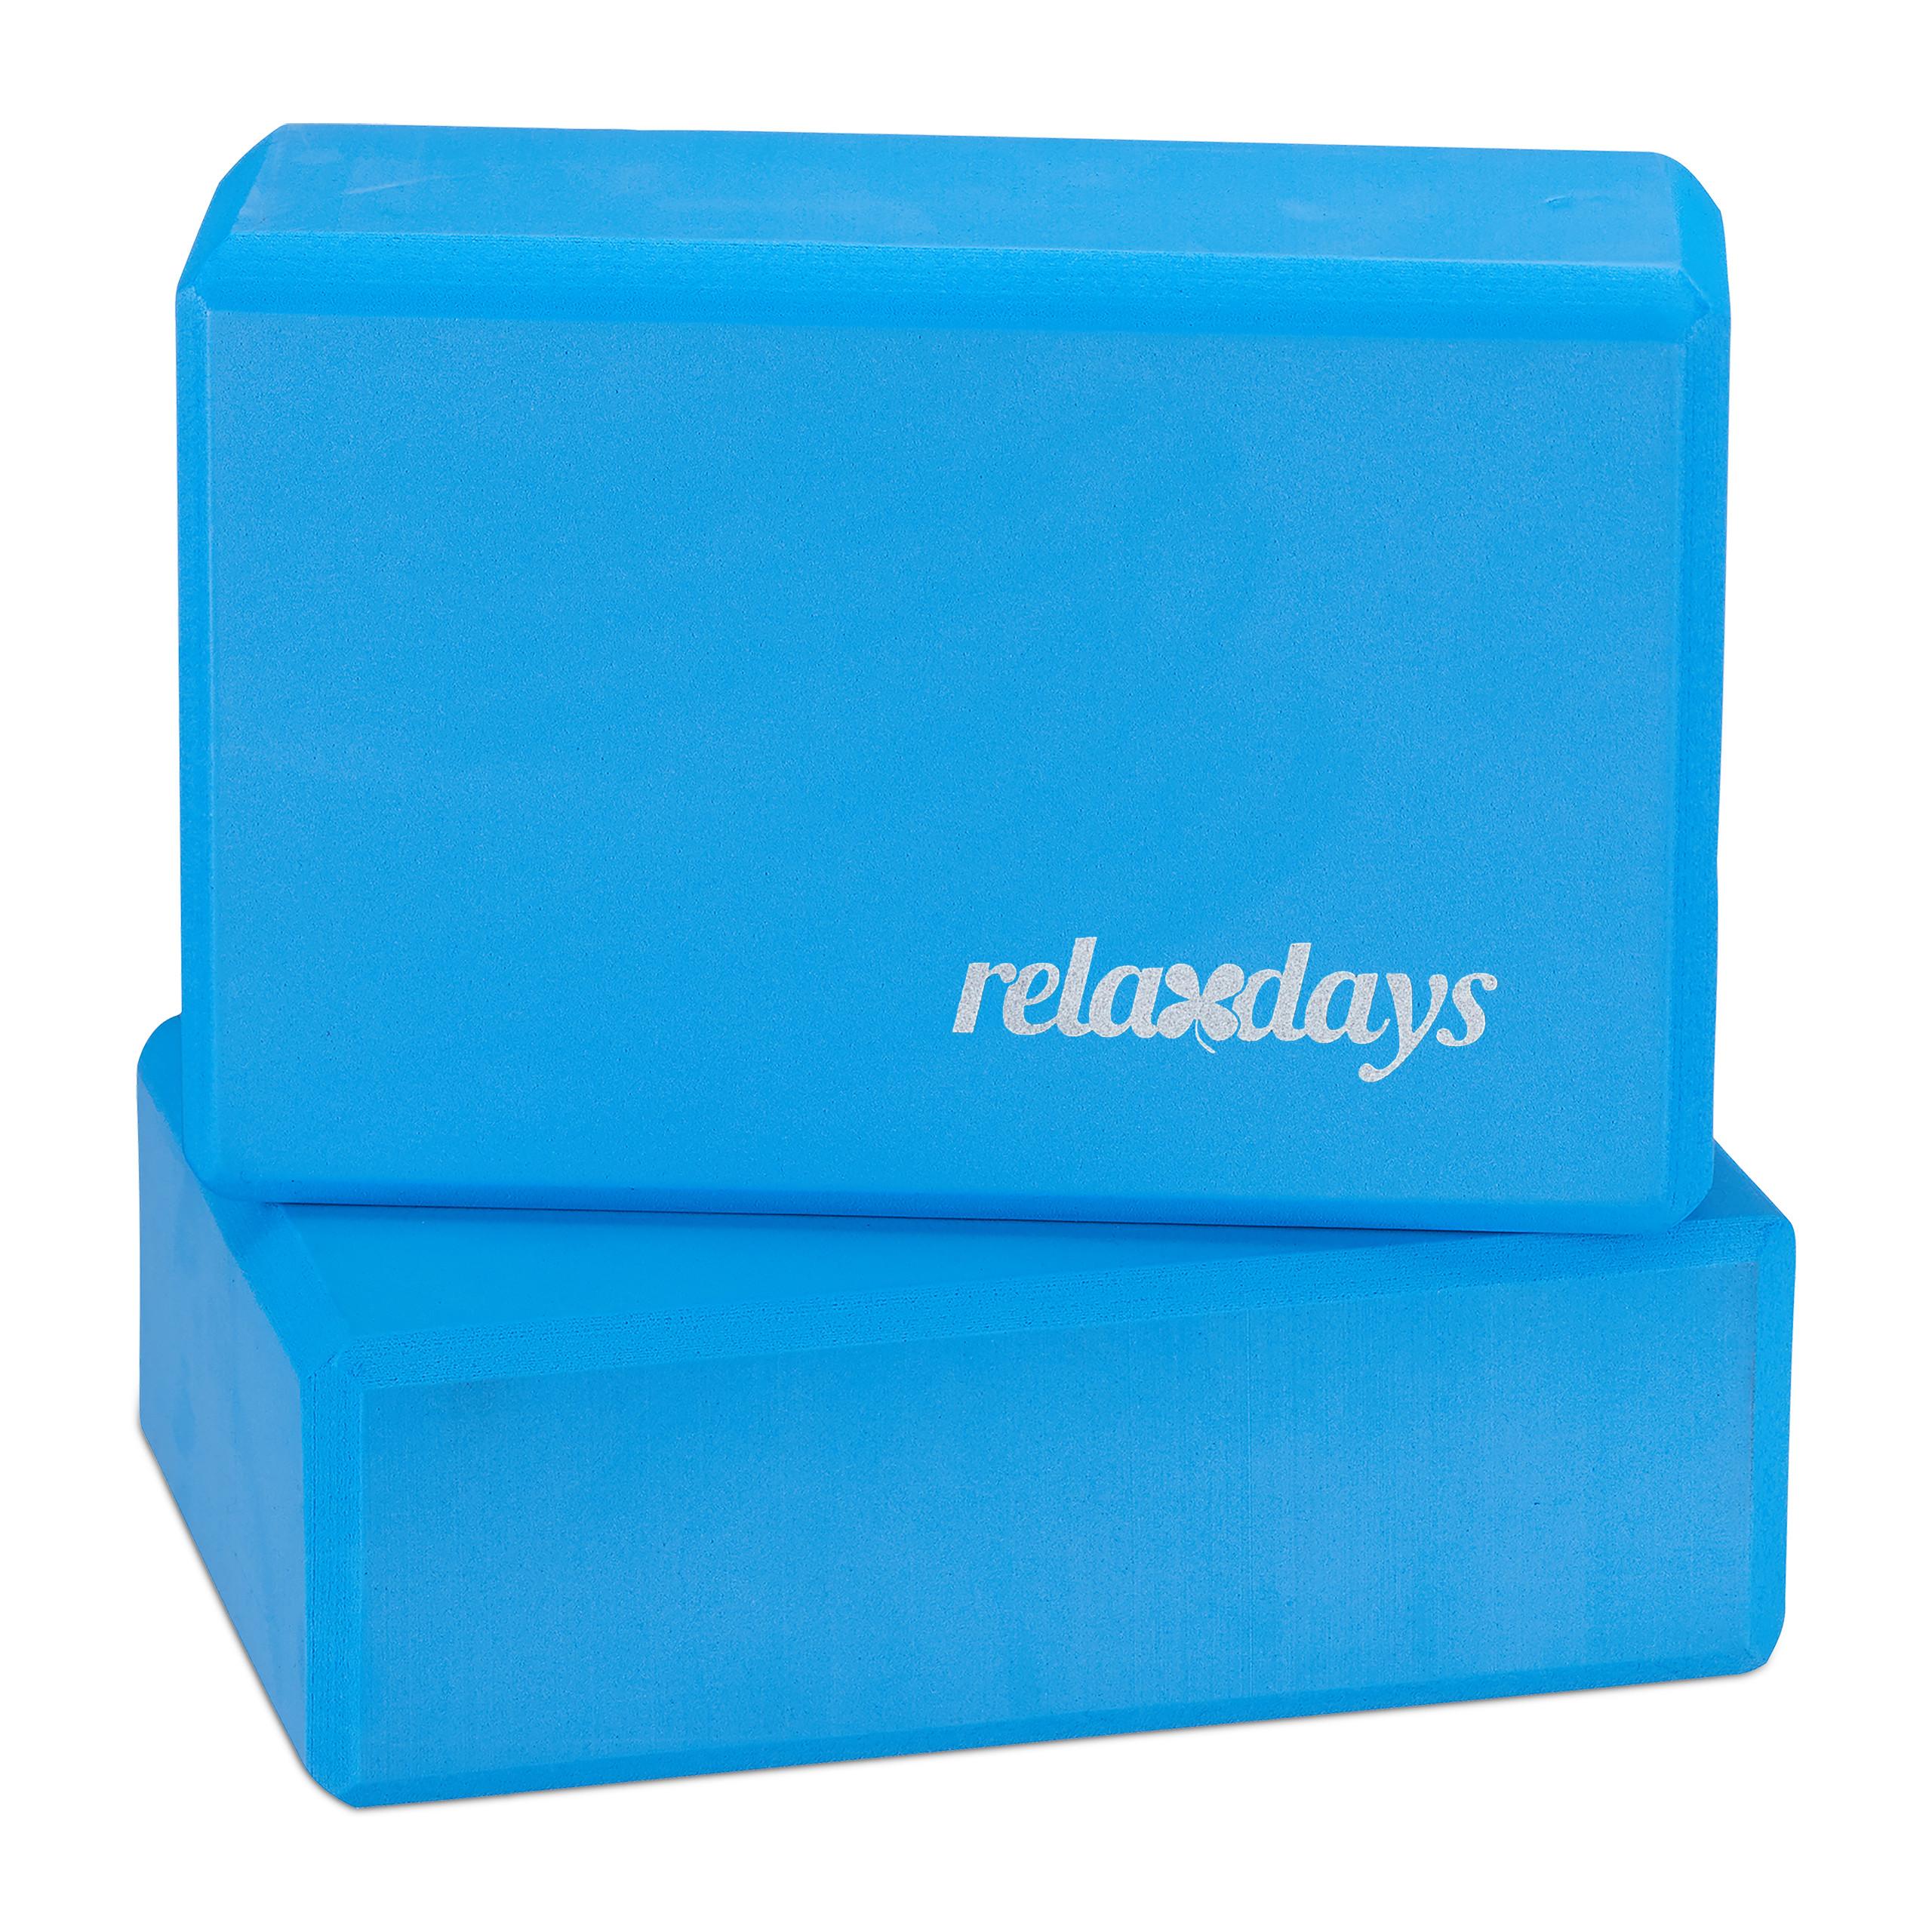 10 x Yogablock blau Schaumstoff Yoga-Klötze Hartschaum Yoga-Würfel Sport